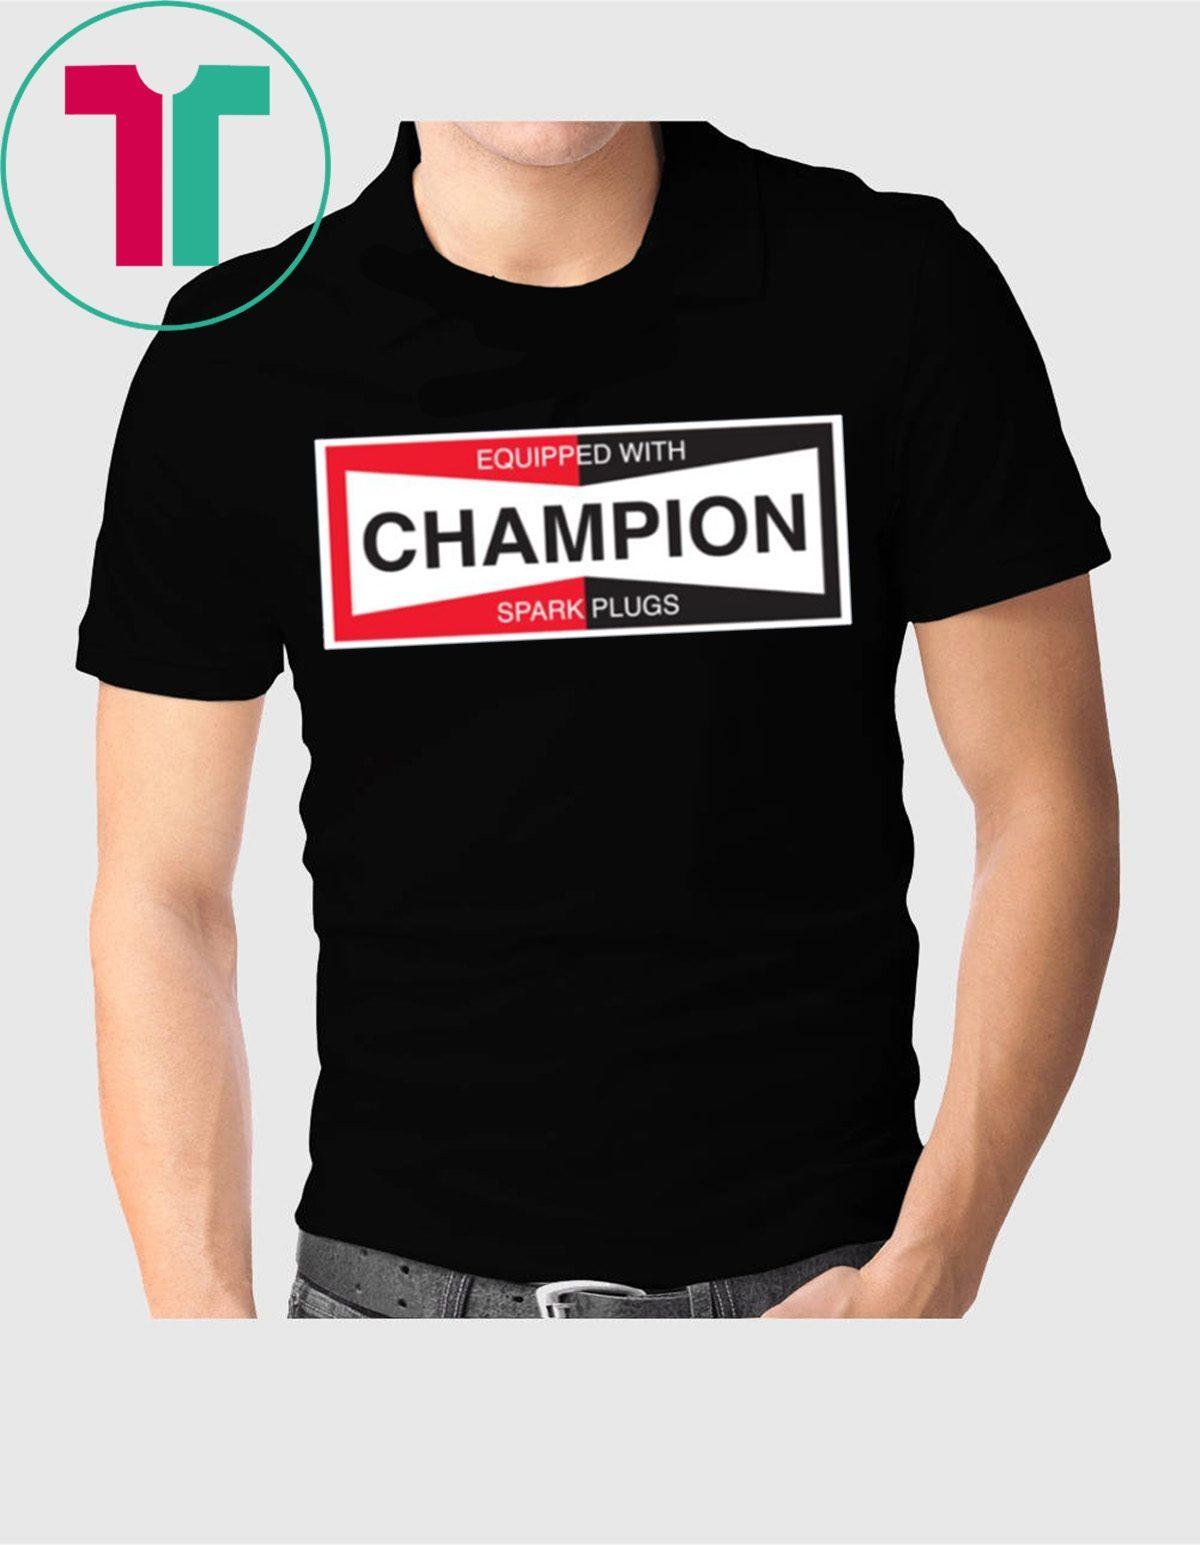 Champion Spark Plug Shirt